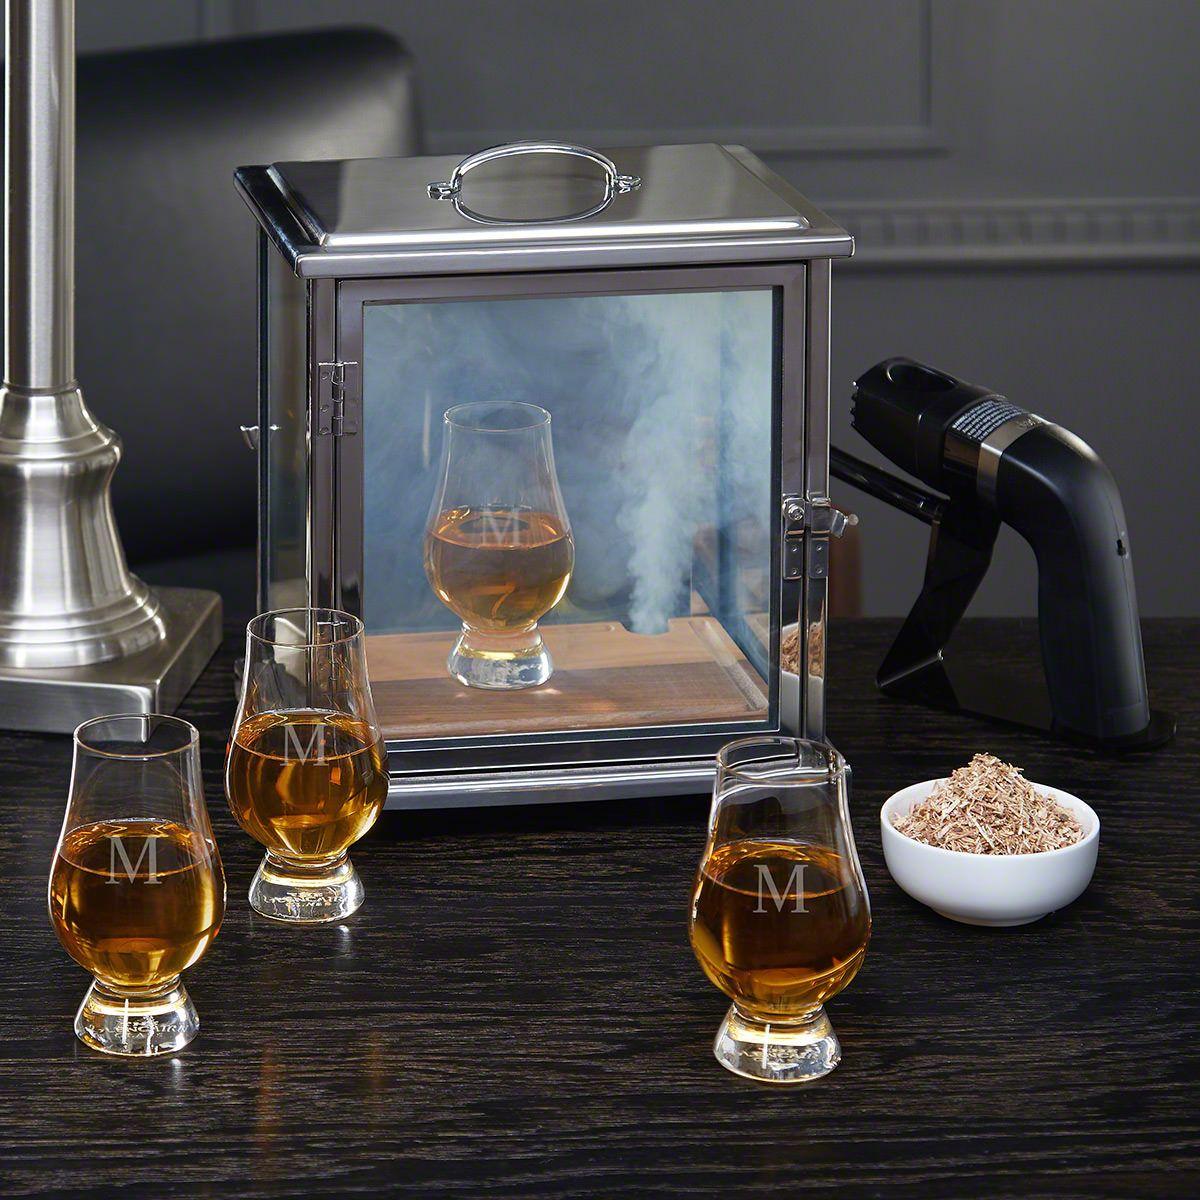 Advanced Smoke Box Kit with Engraved Glencairn Whiskey Glasses